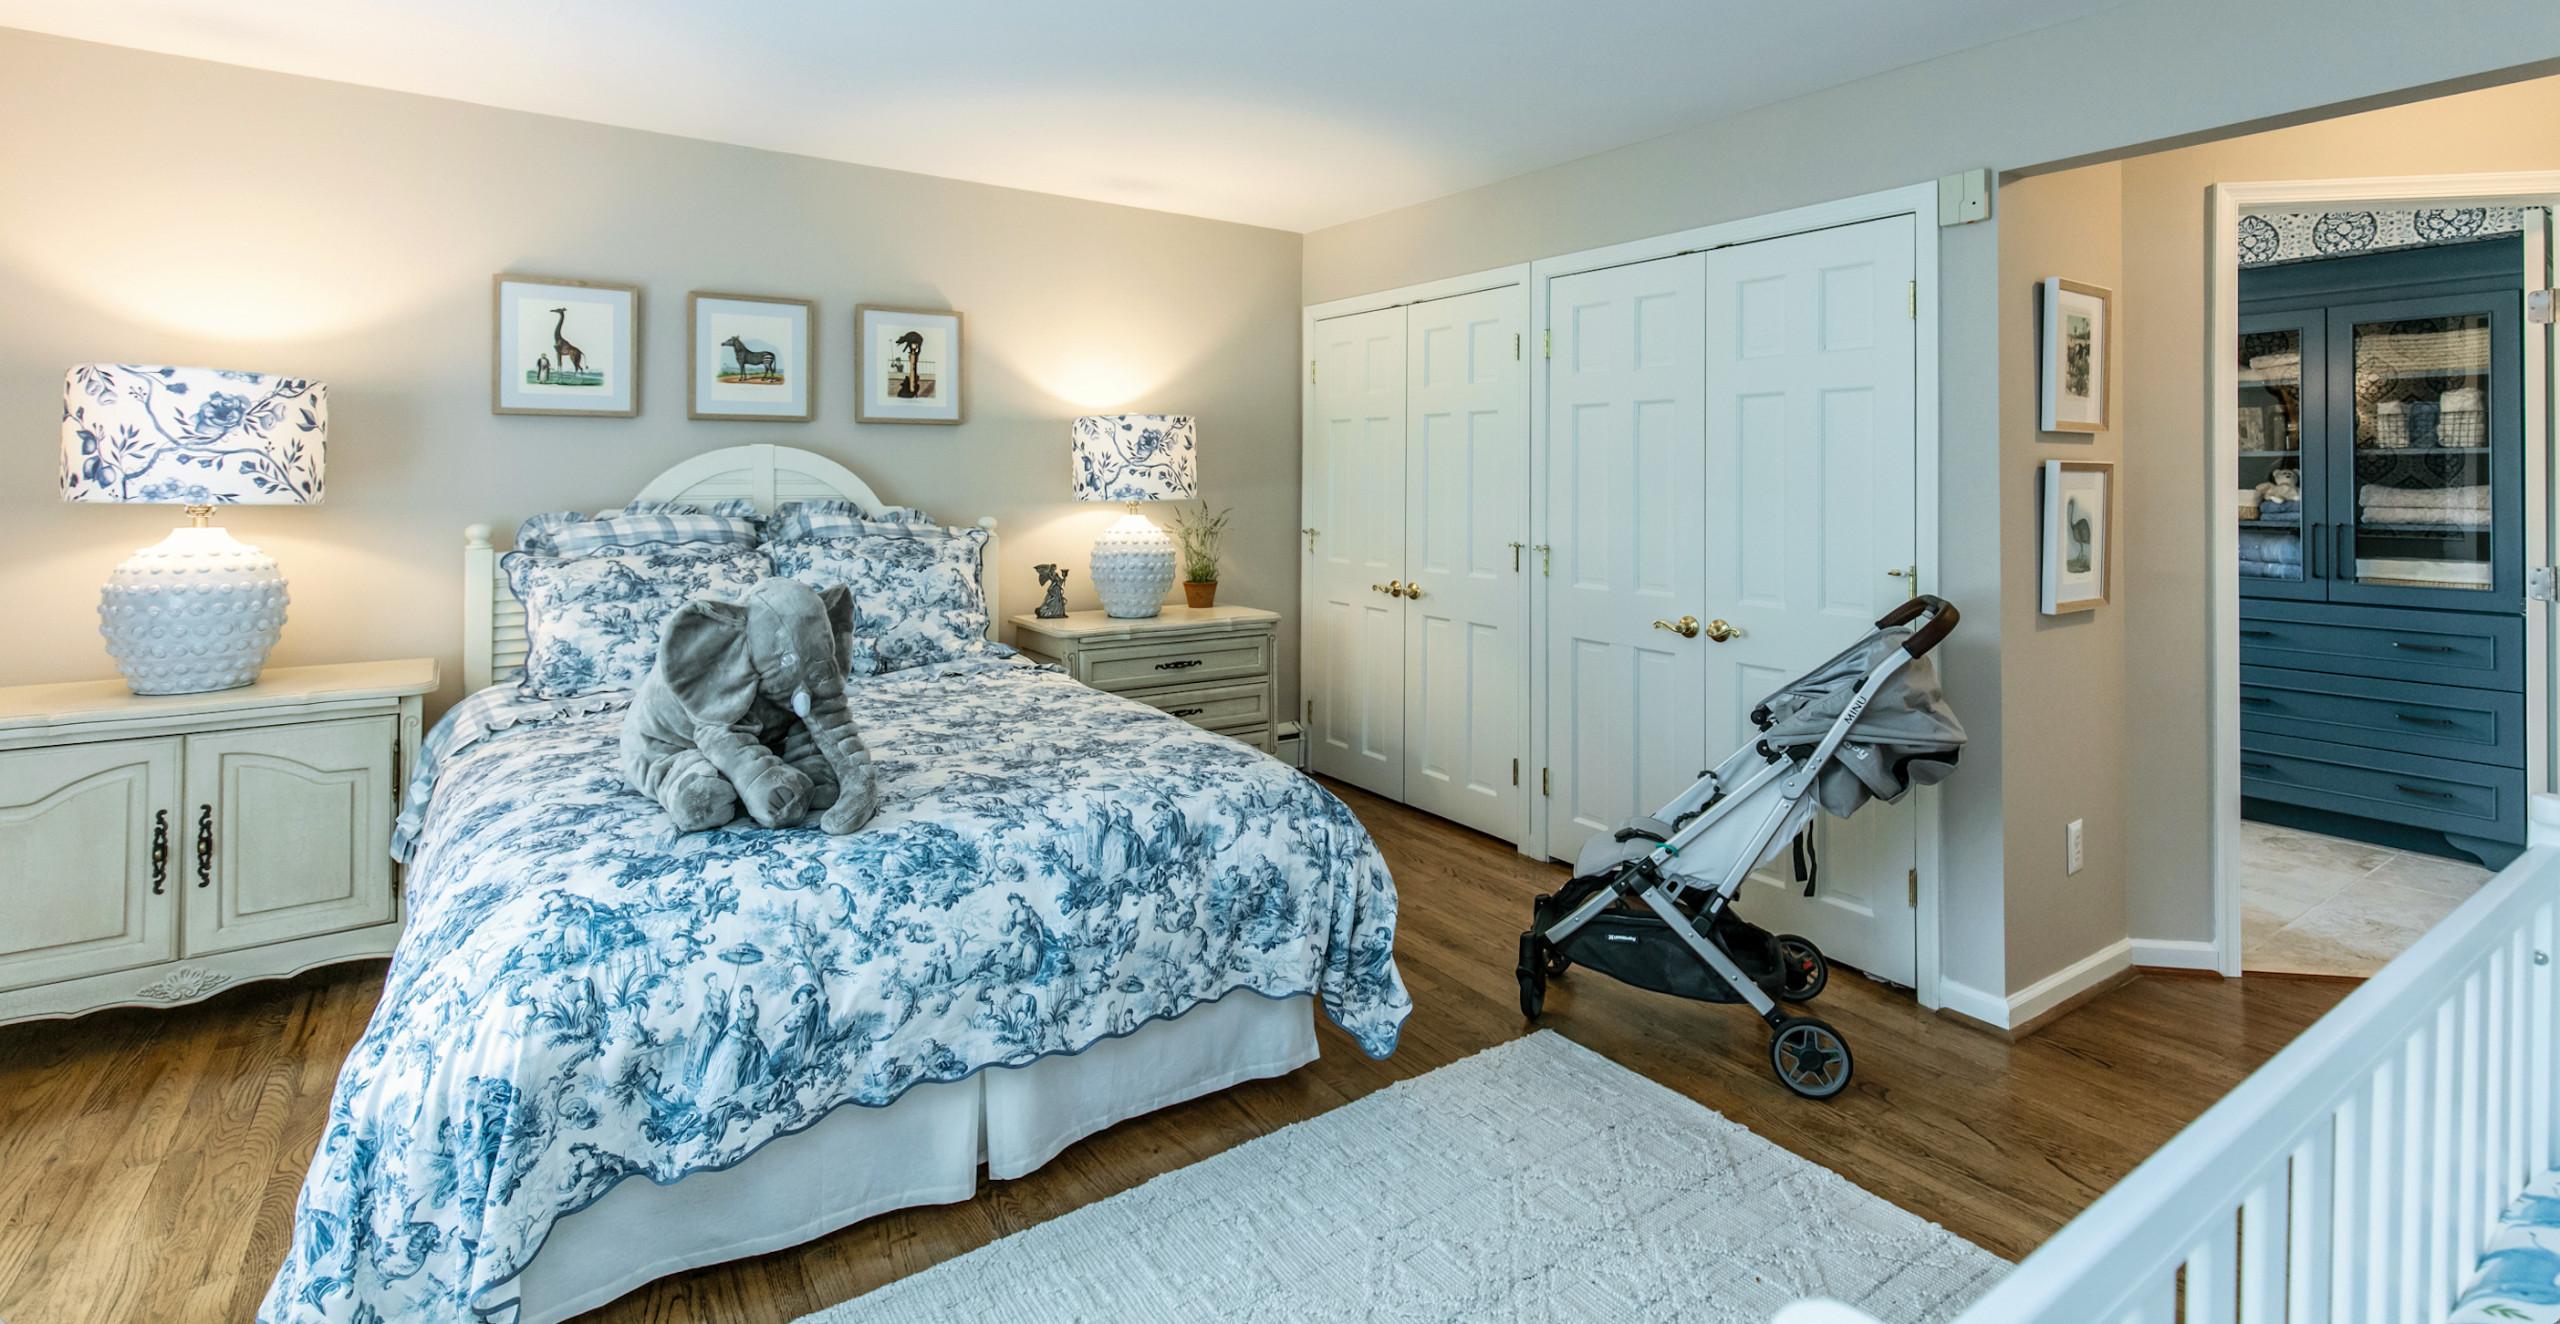 Haddonfield, NJ -  Guest / Baby's Room and Bathroom